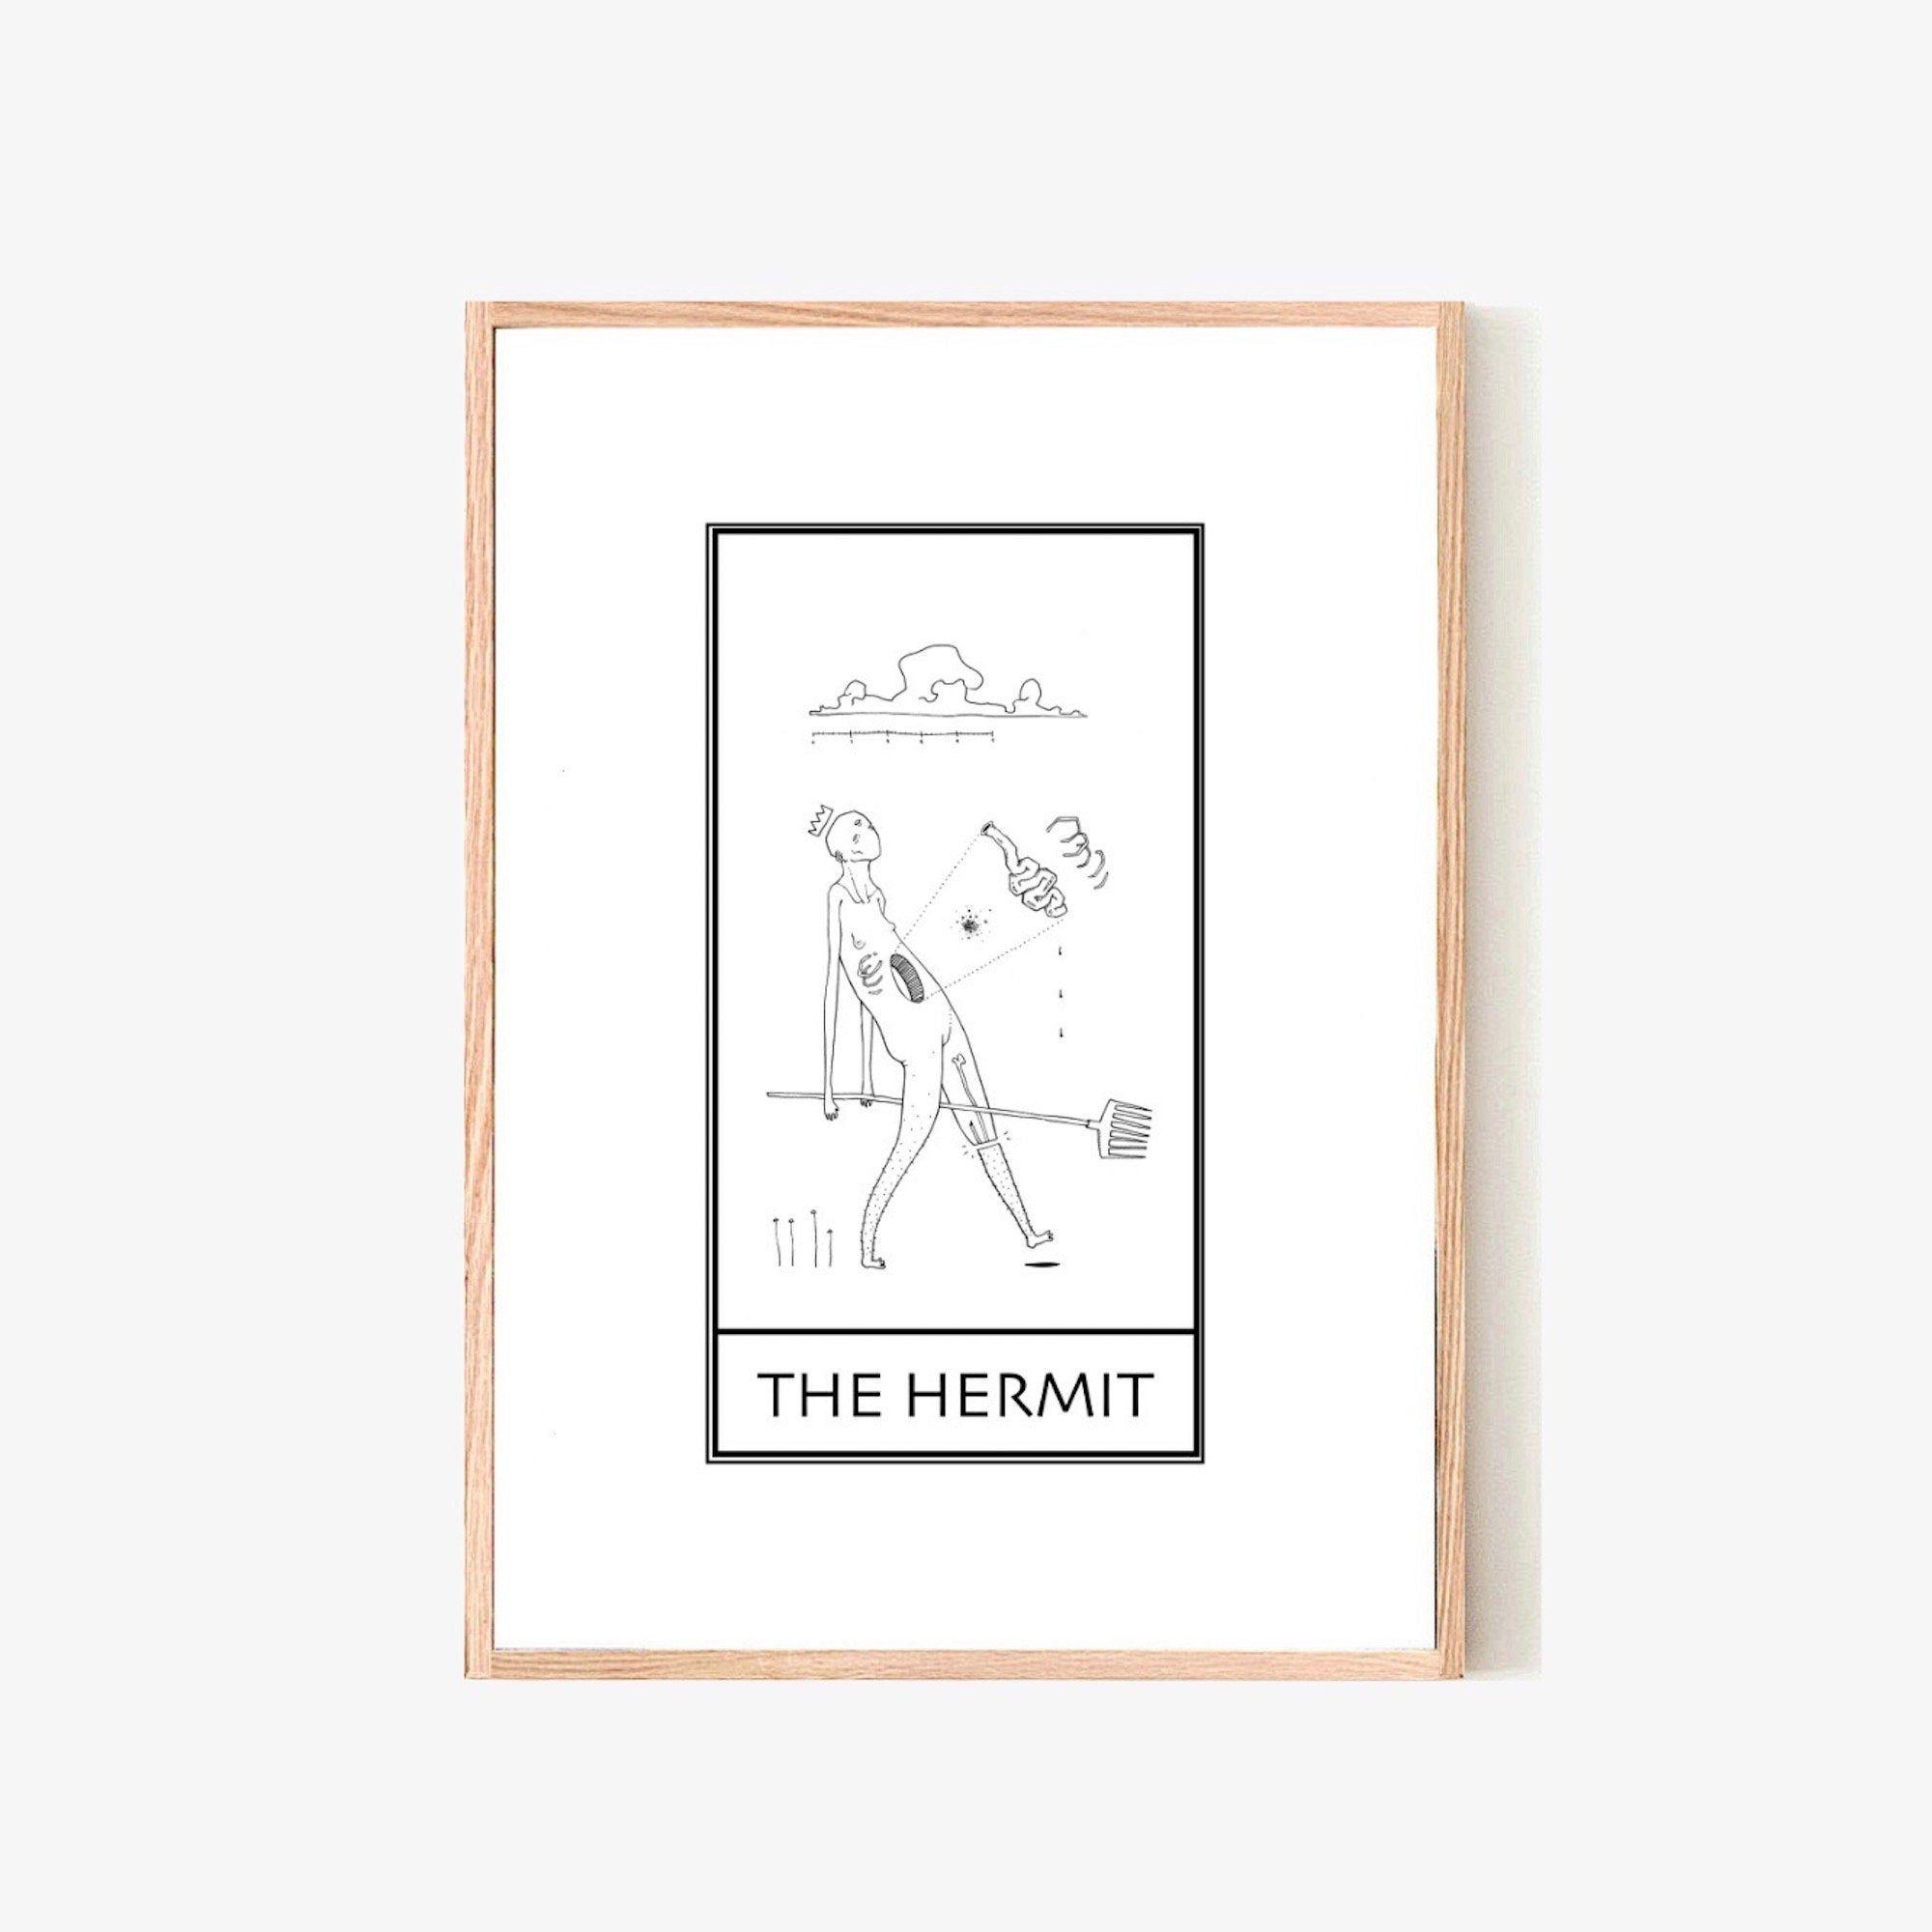 THE HERMIT | Tarot card print | Occult wall art | Witchy decor | Minimalist line art | Wiccan decor | Tarot poster